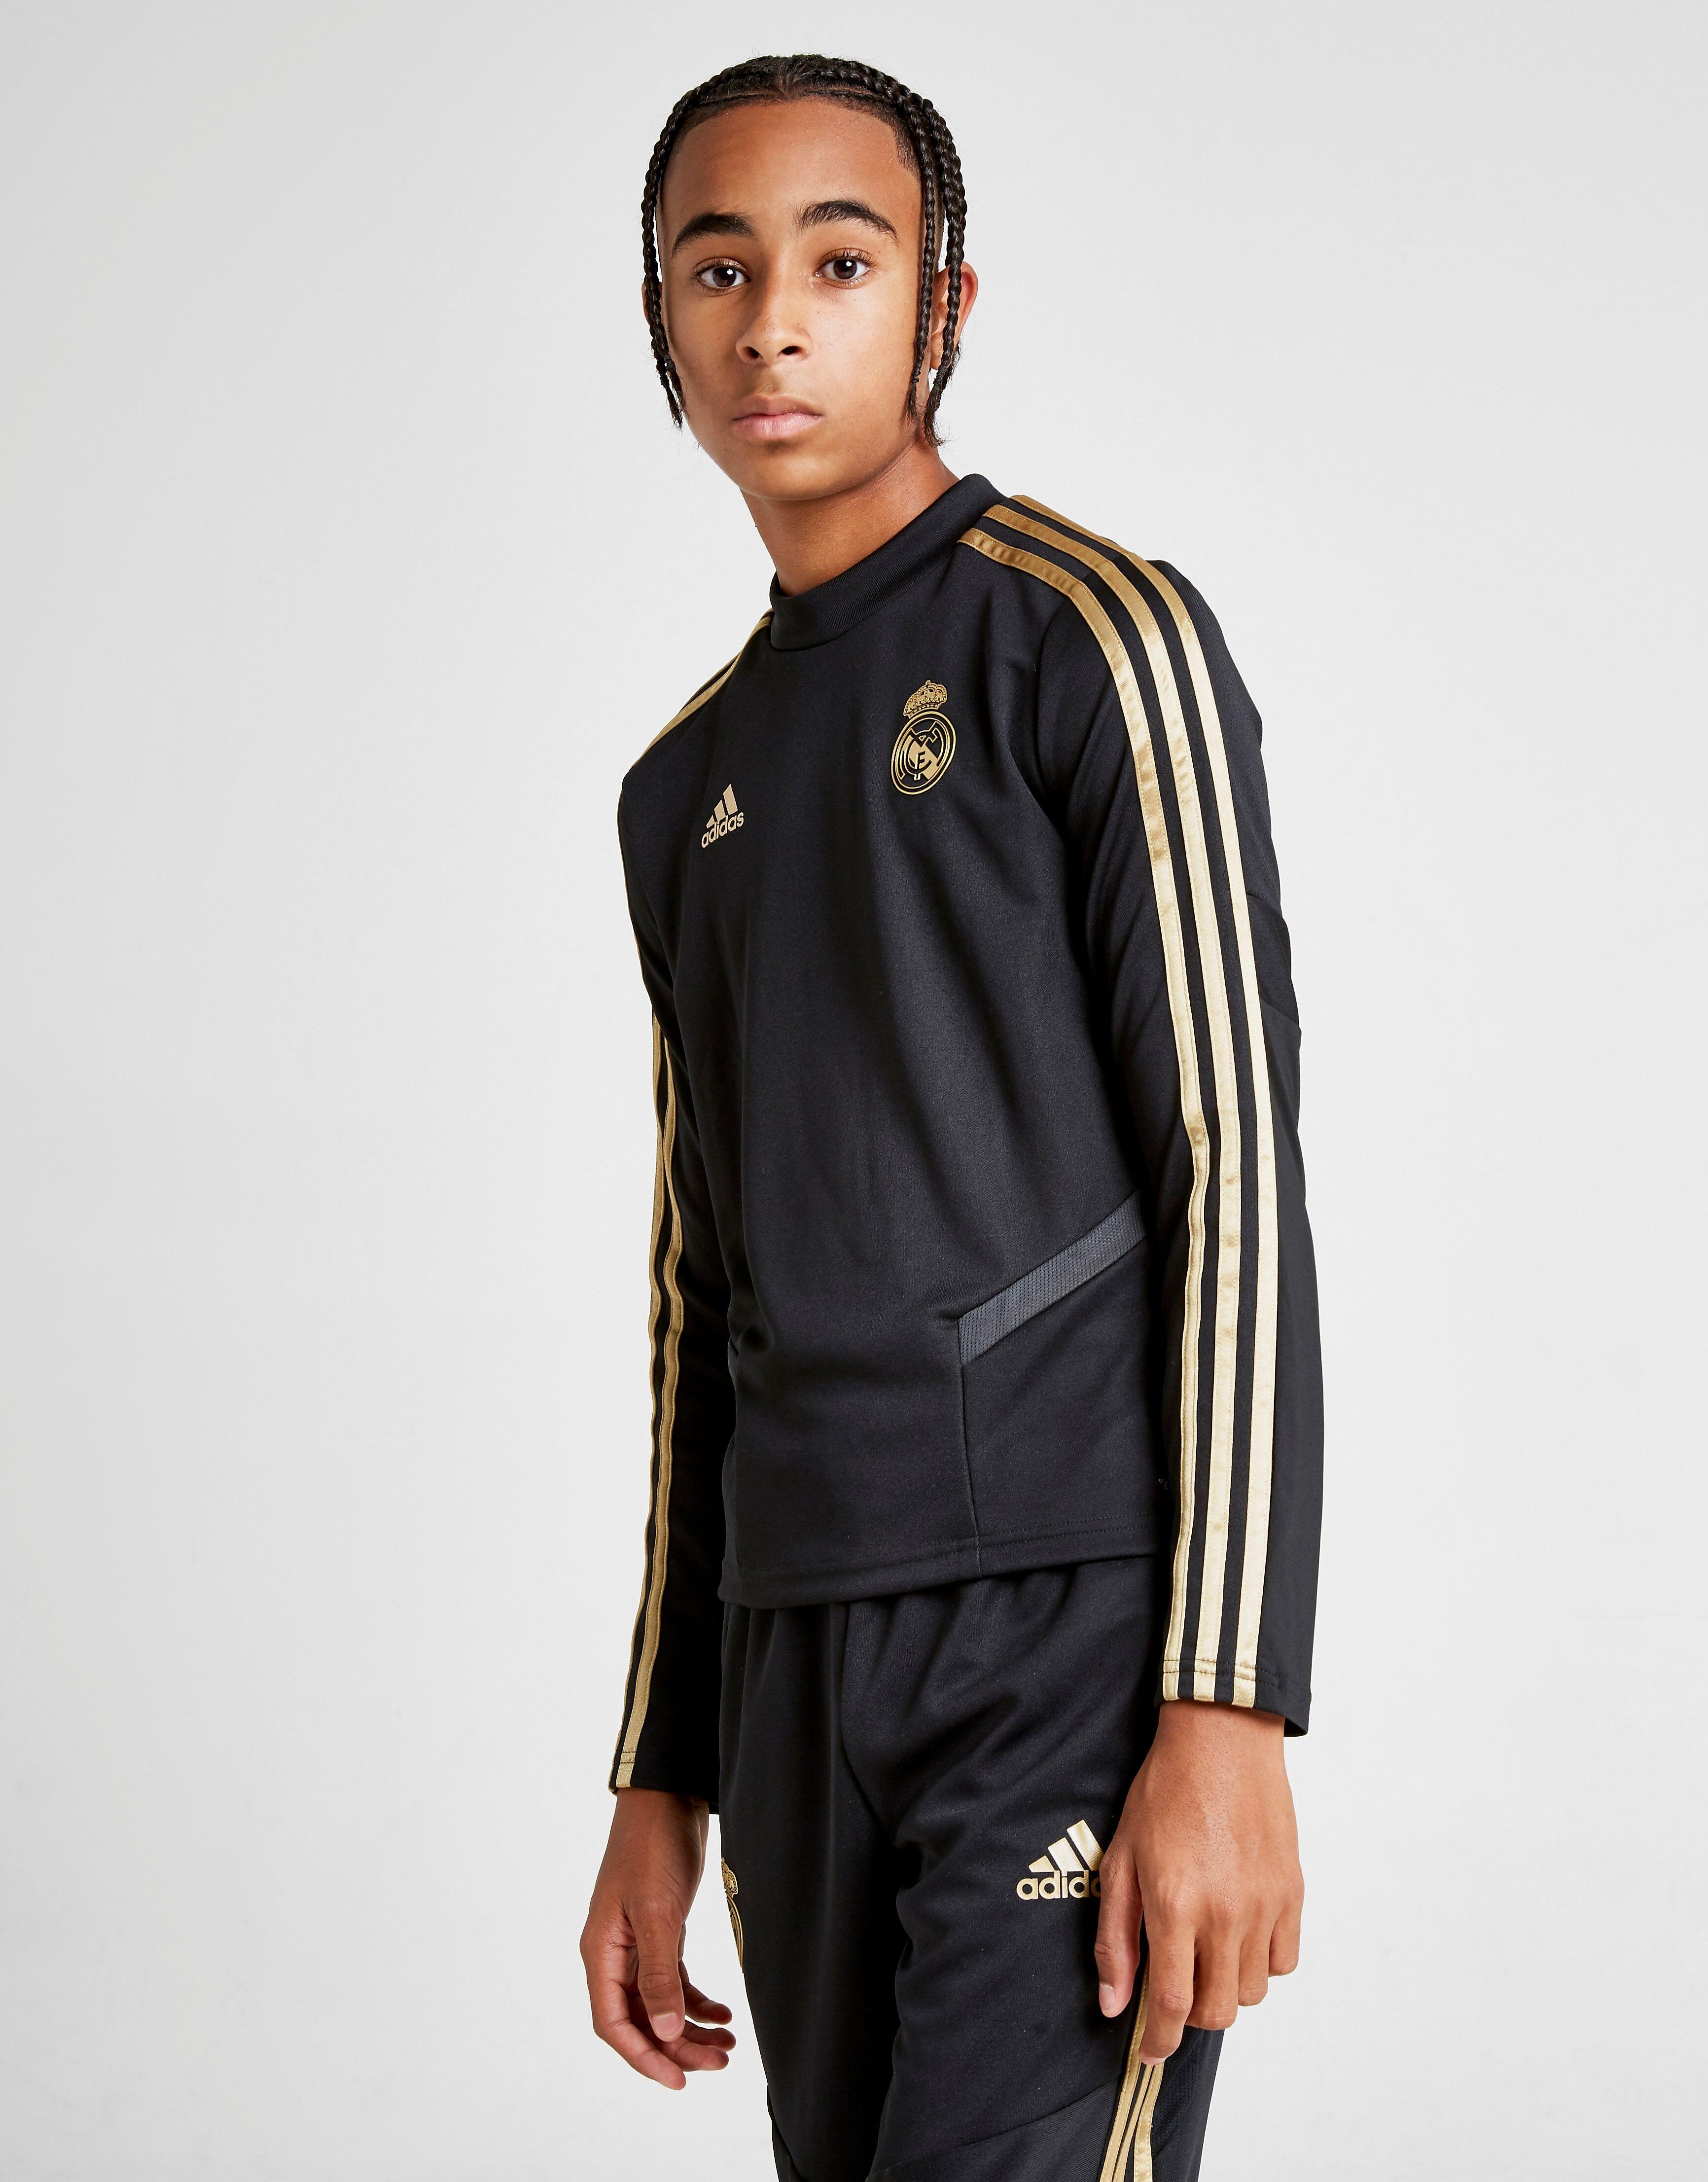 Image of Adidas Real Madrid Treenipaita Juniorit - Kids, Musta